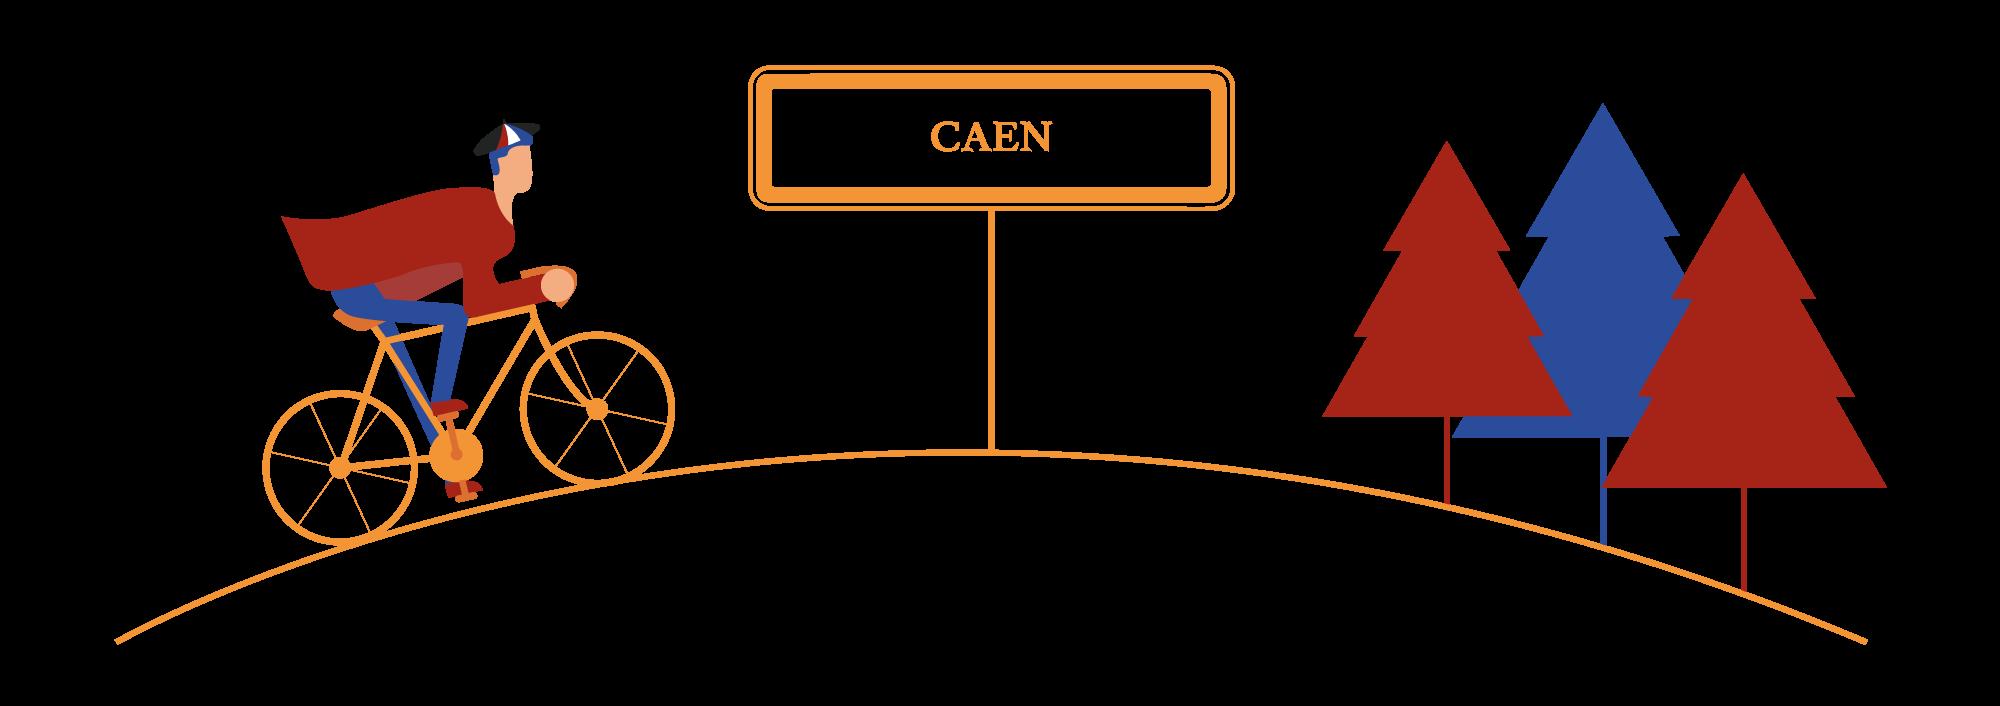 Spécialités de Caen